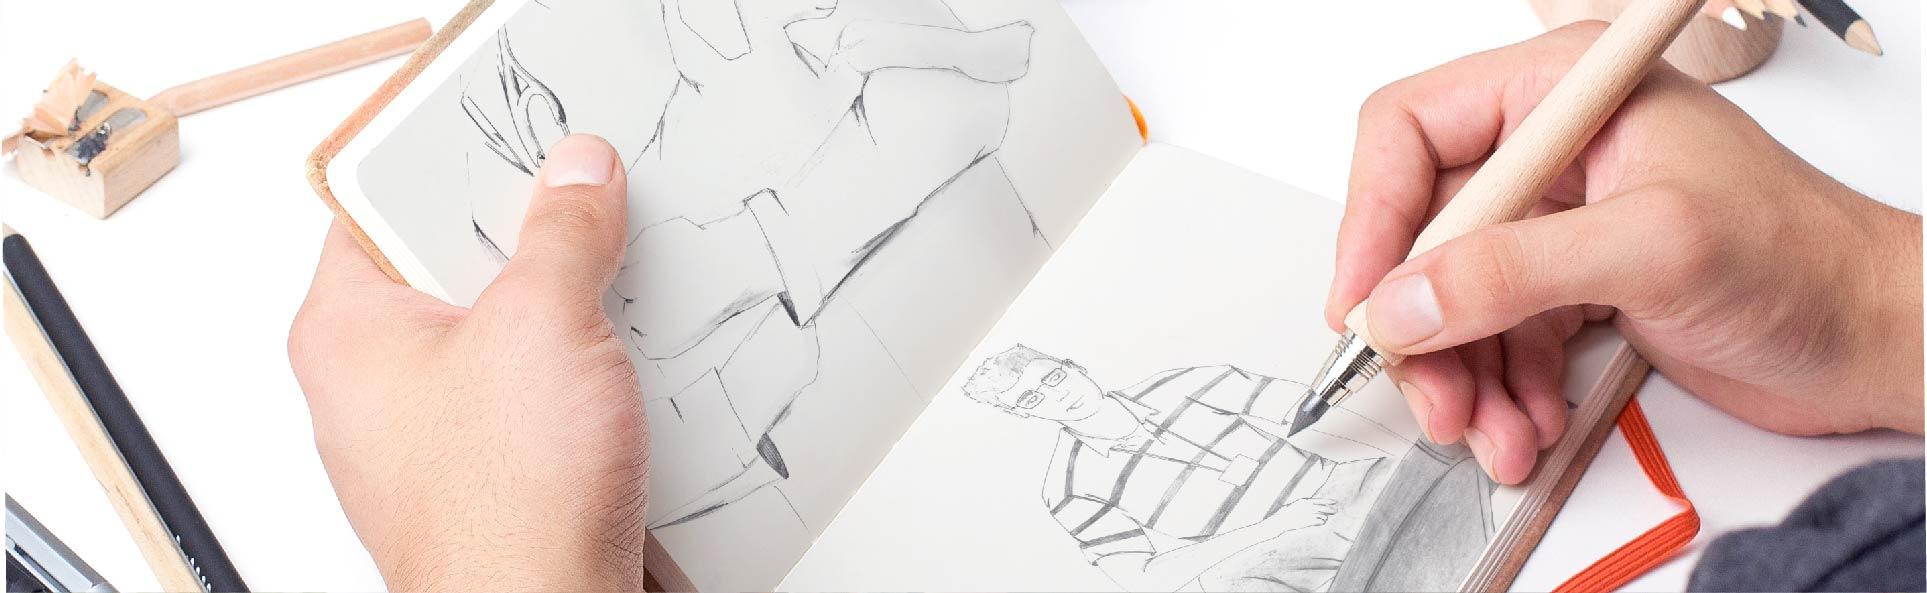 osu sketches